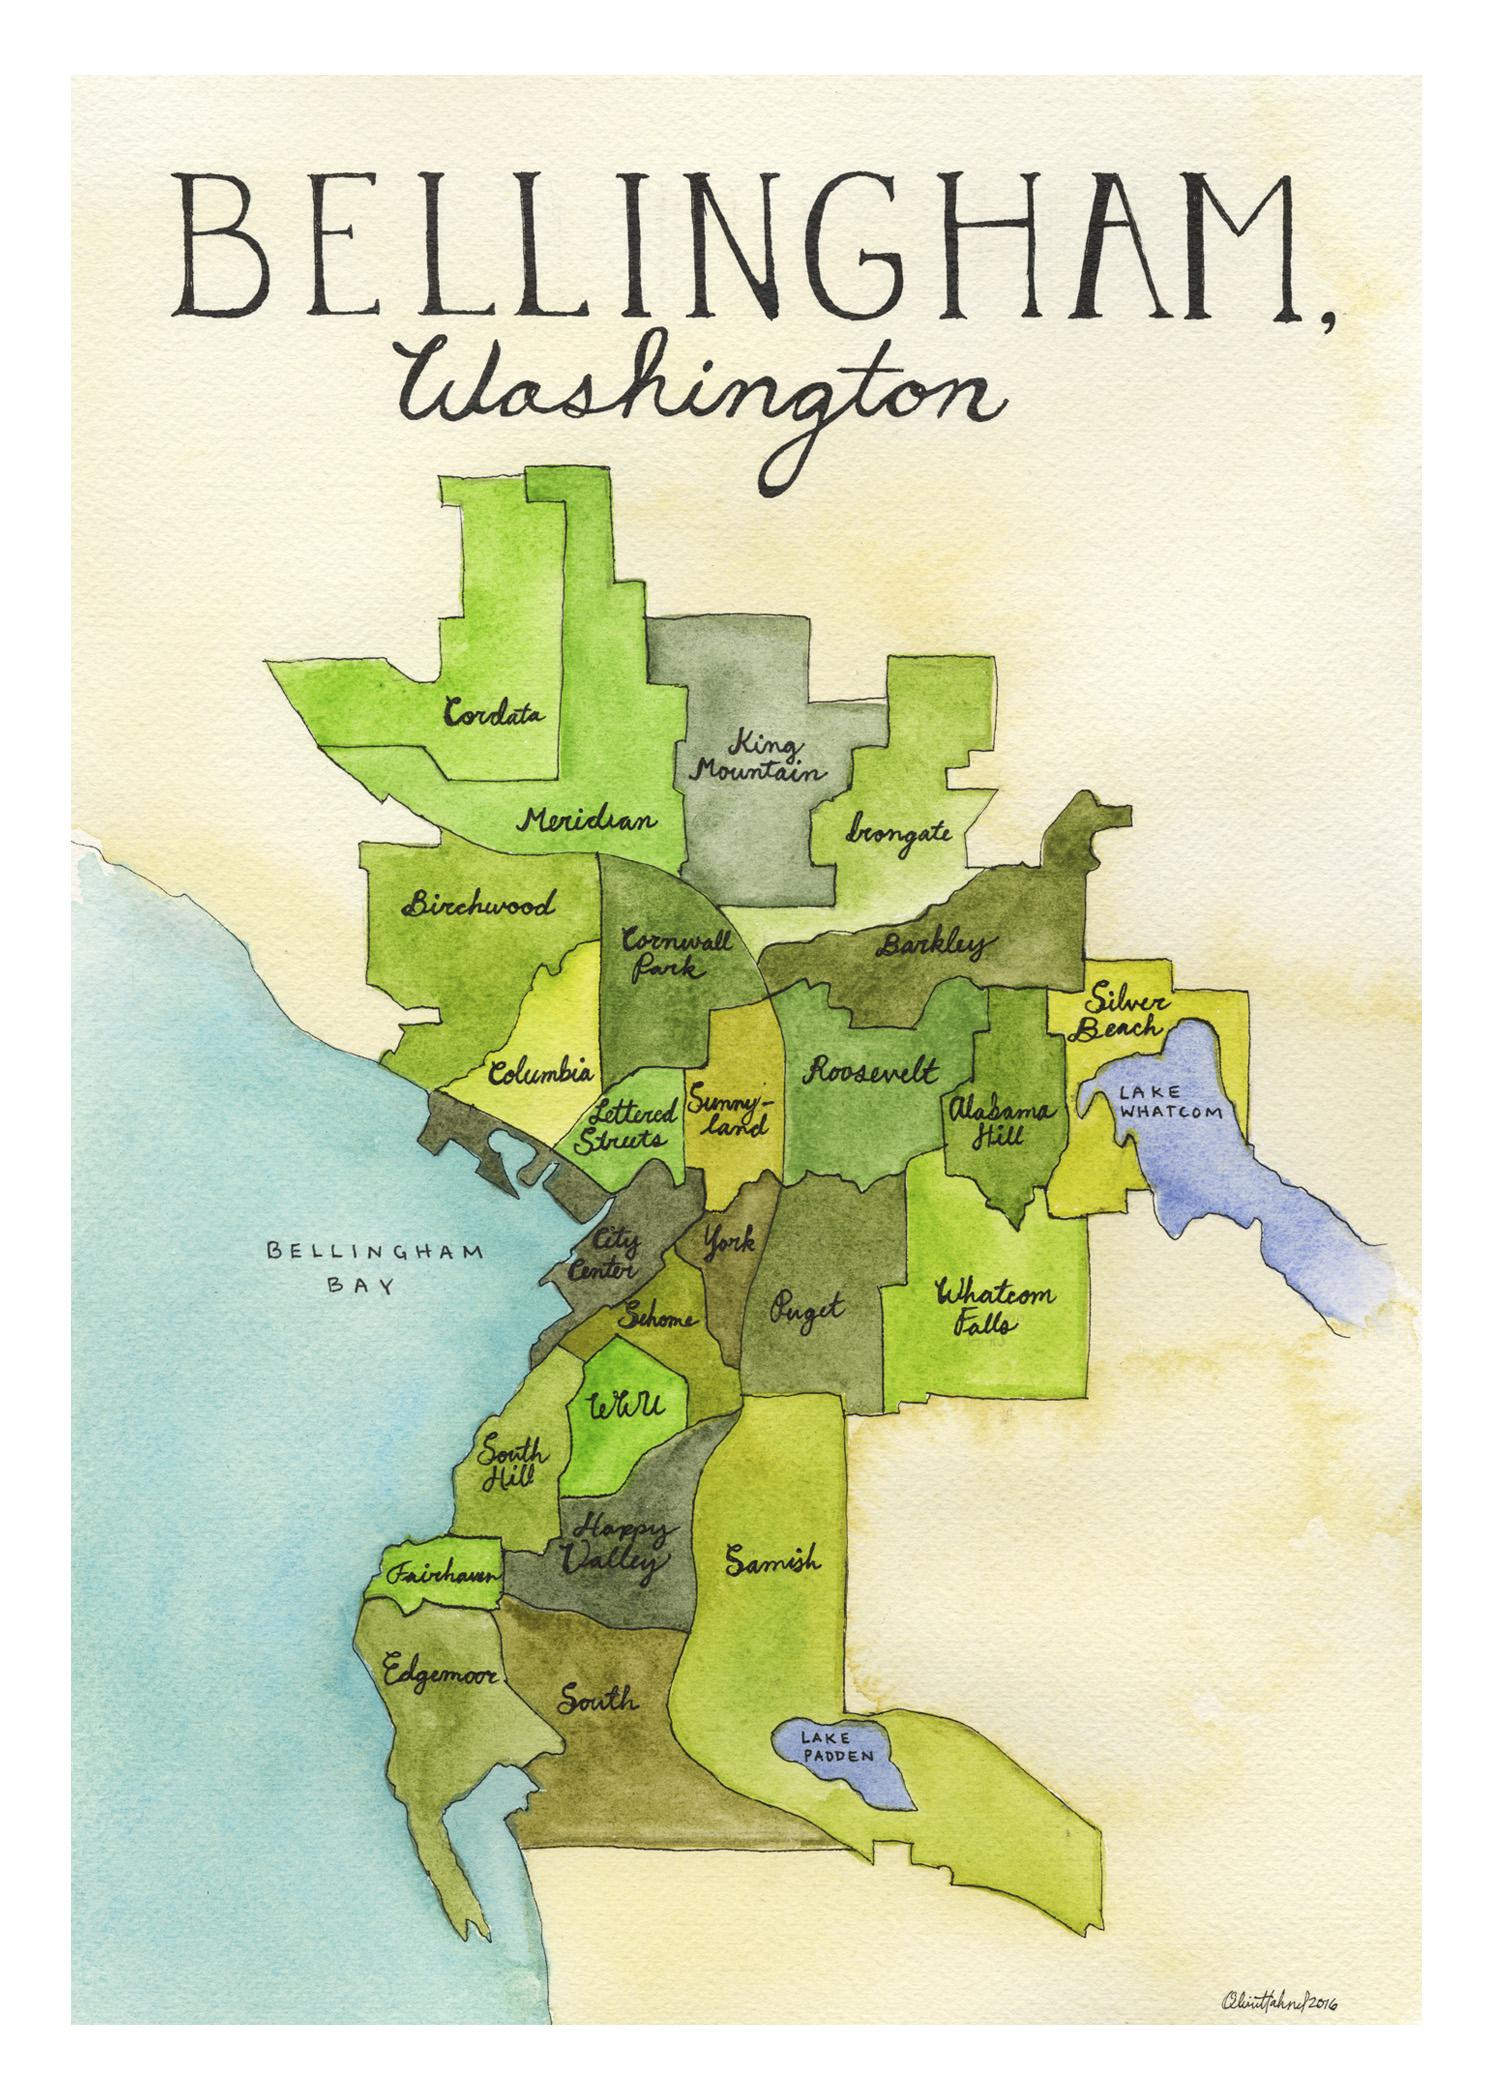 Bellingham Neighborhood Map 2016 Watercolor and India ink